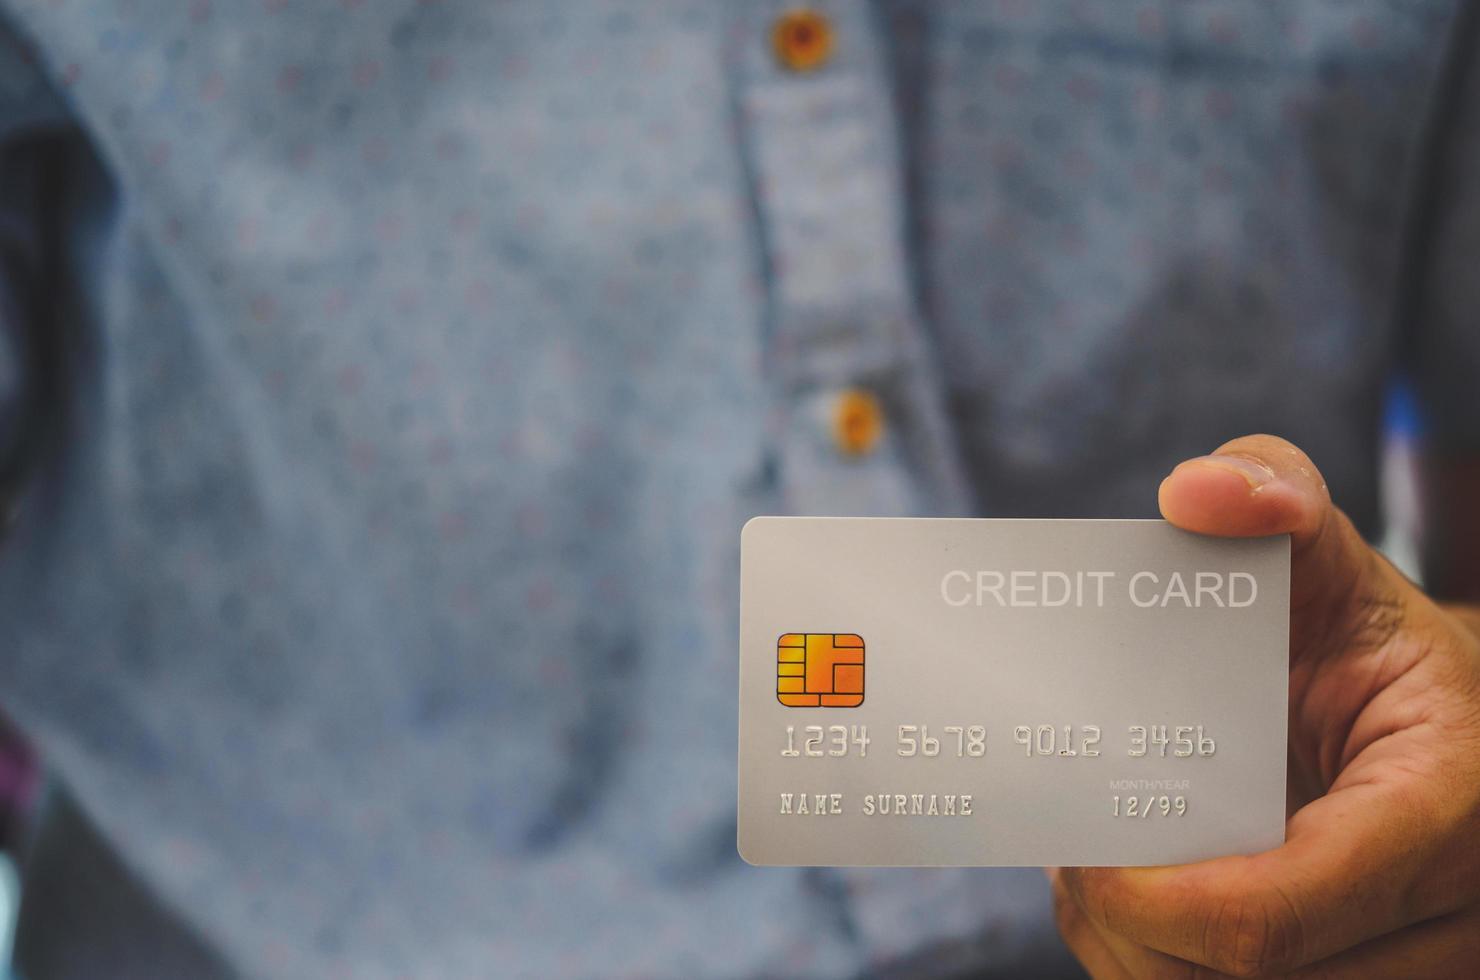 Mann Hand hält Kreditkarte foto